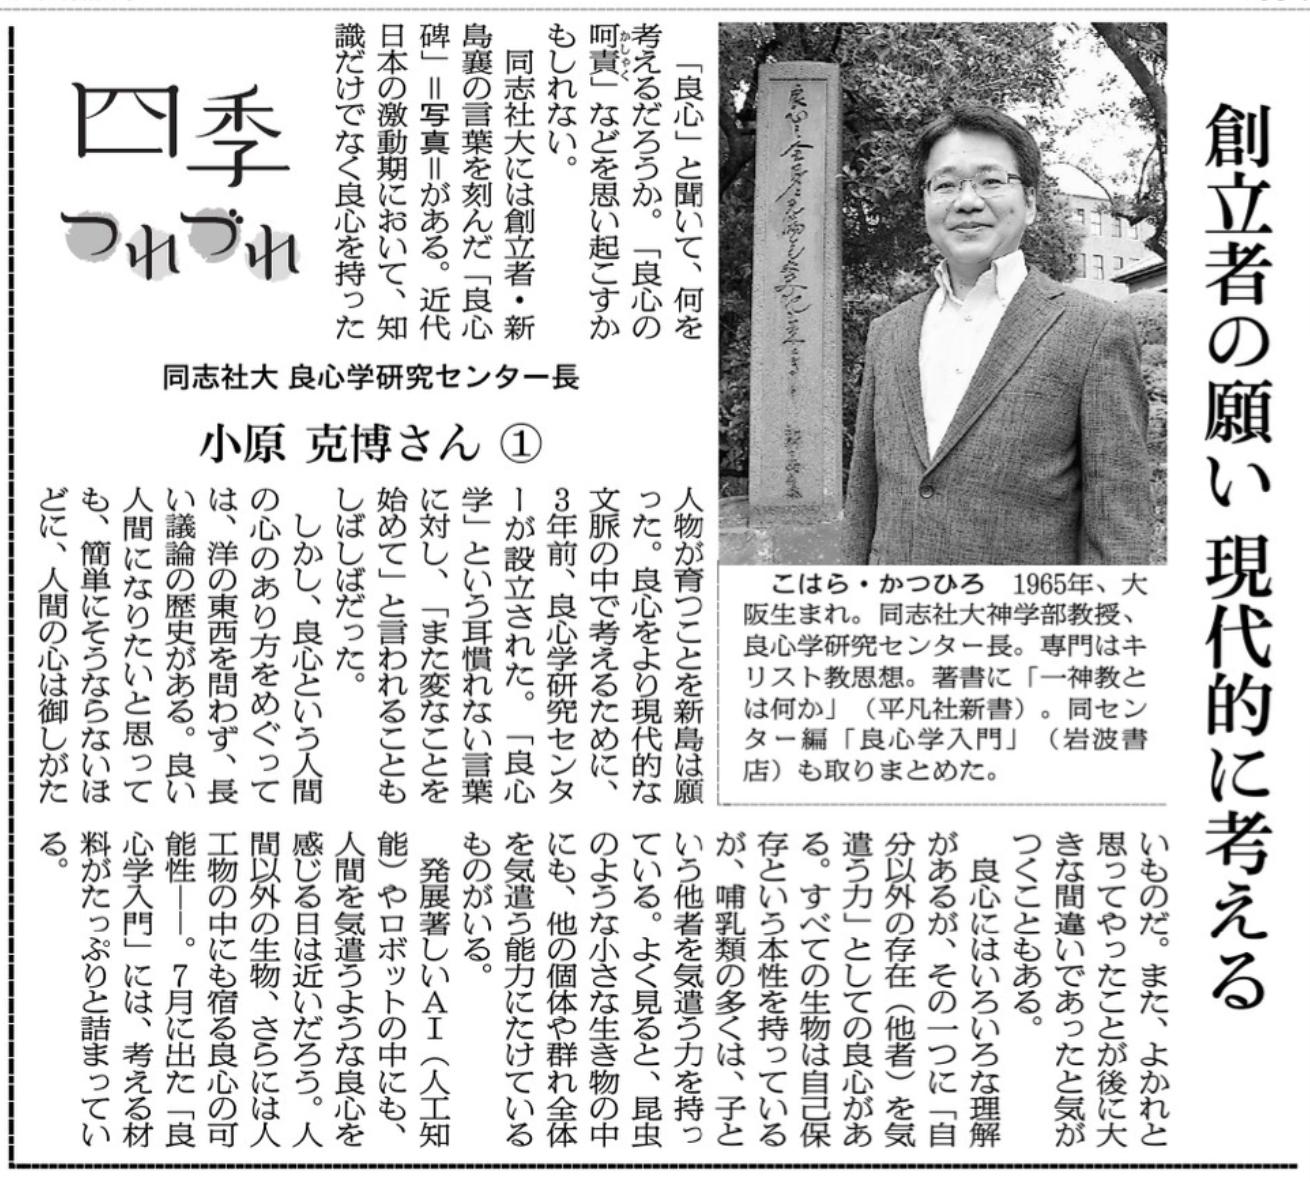 http://www.kohara.ac/essays/images/Asahi20180919m.png